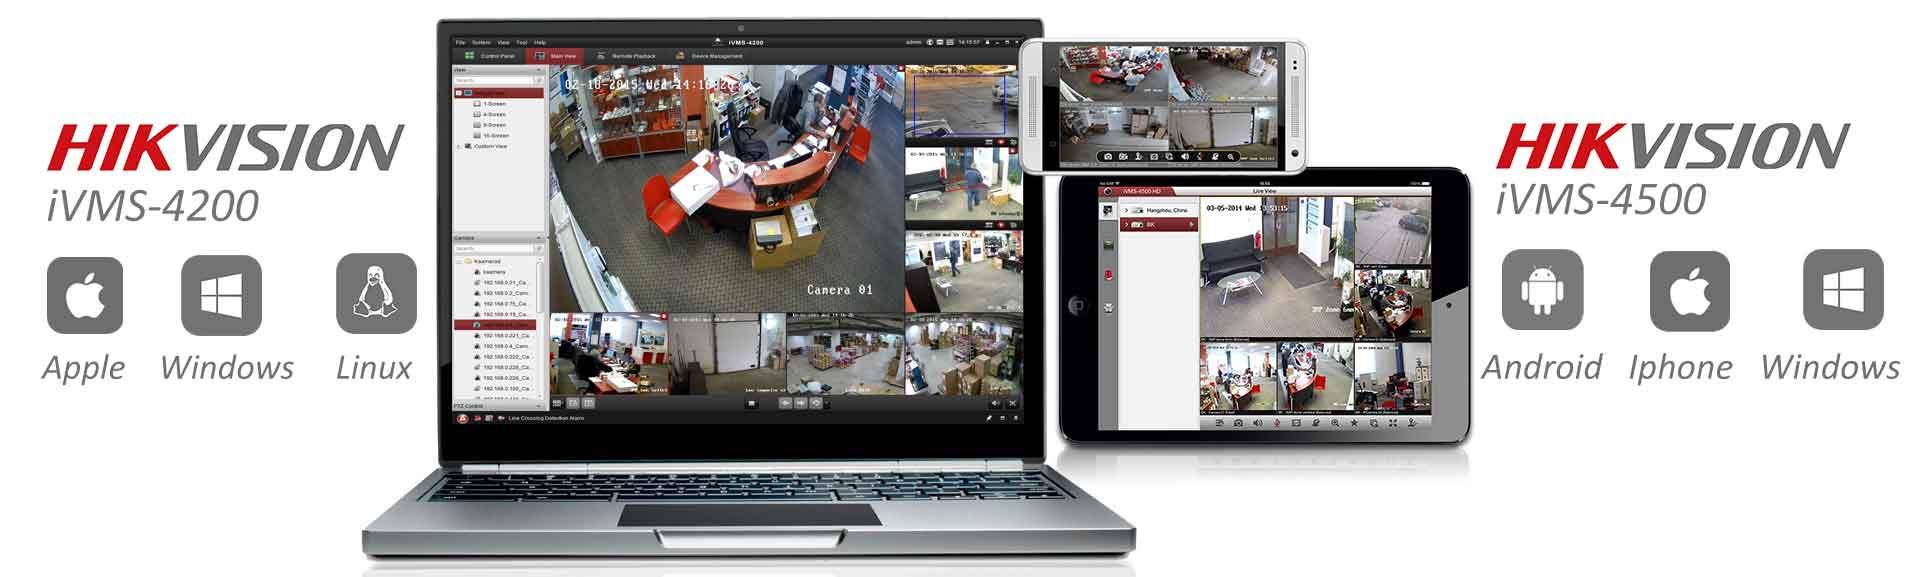 Phần mềm hỗ trợ camera hikvision